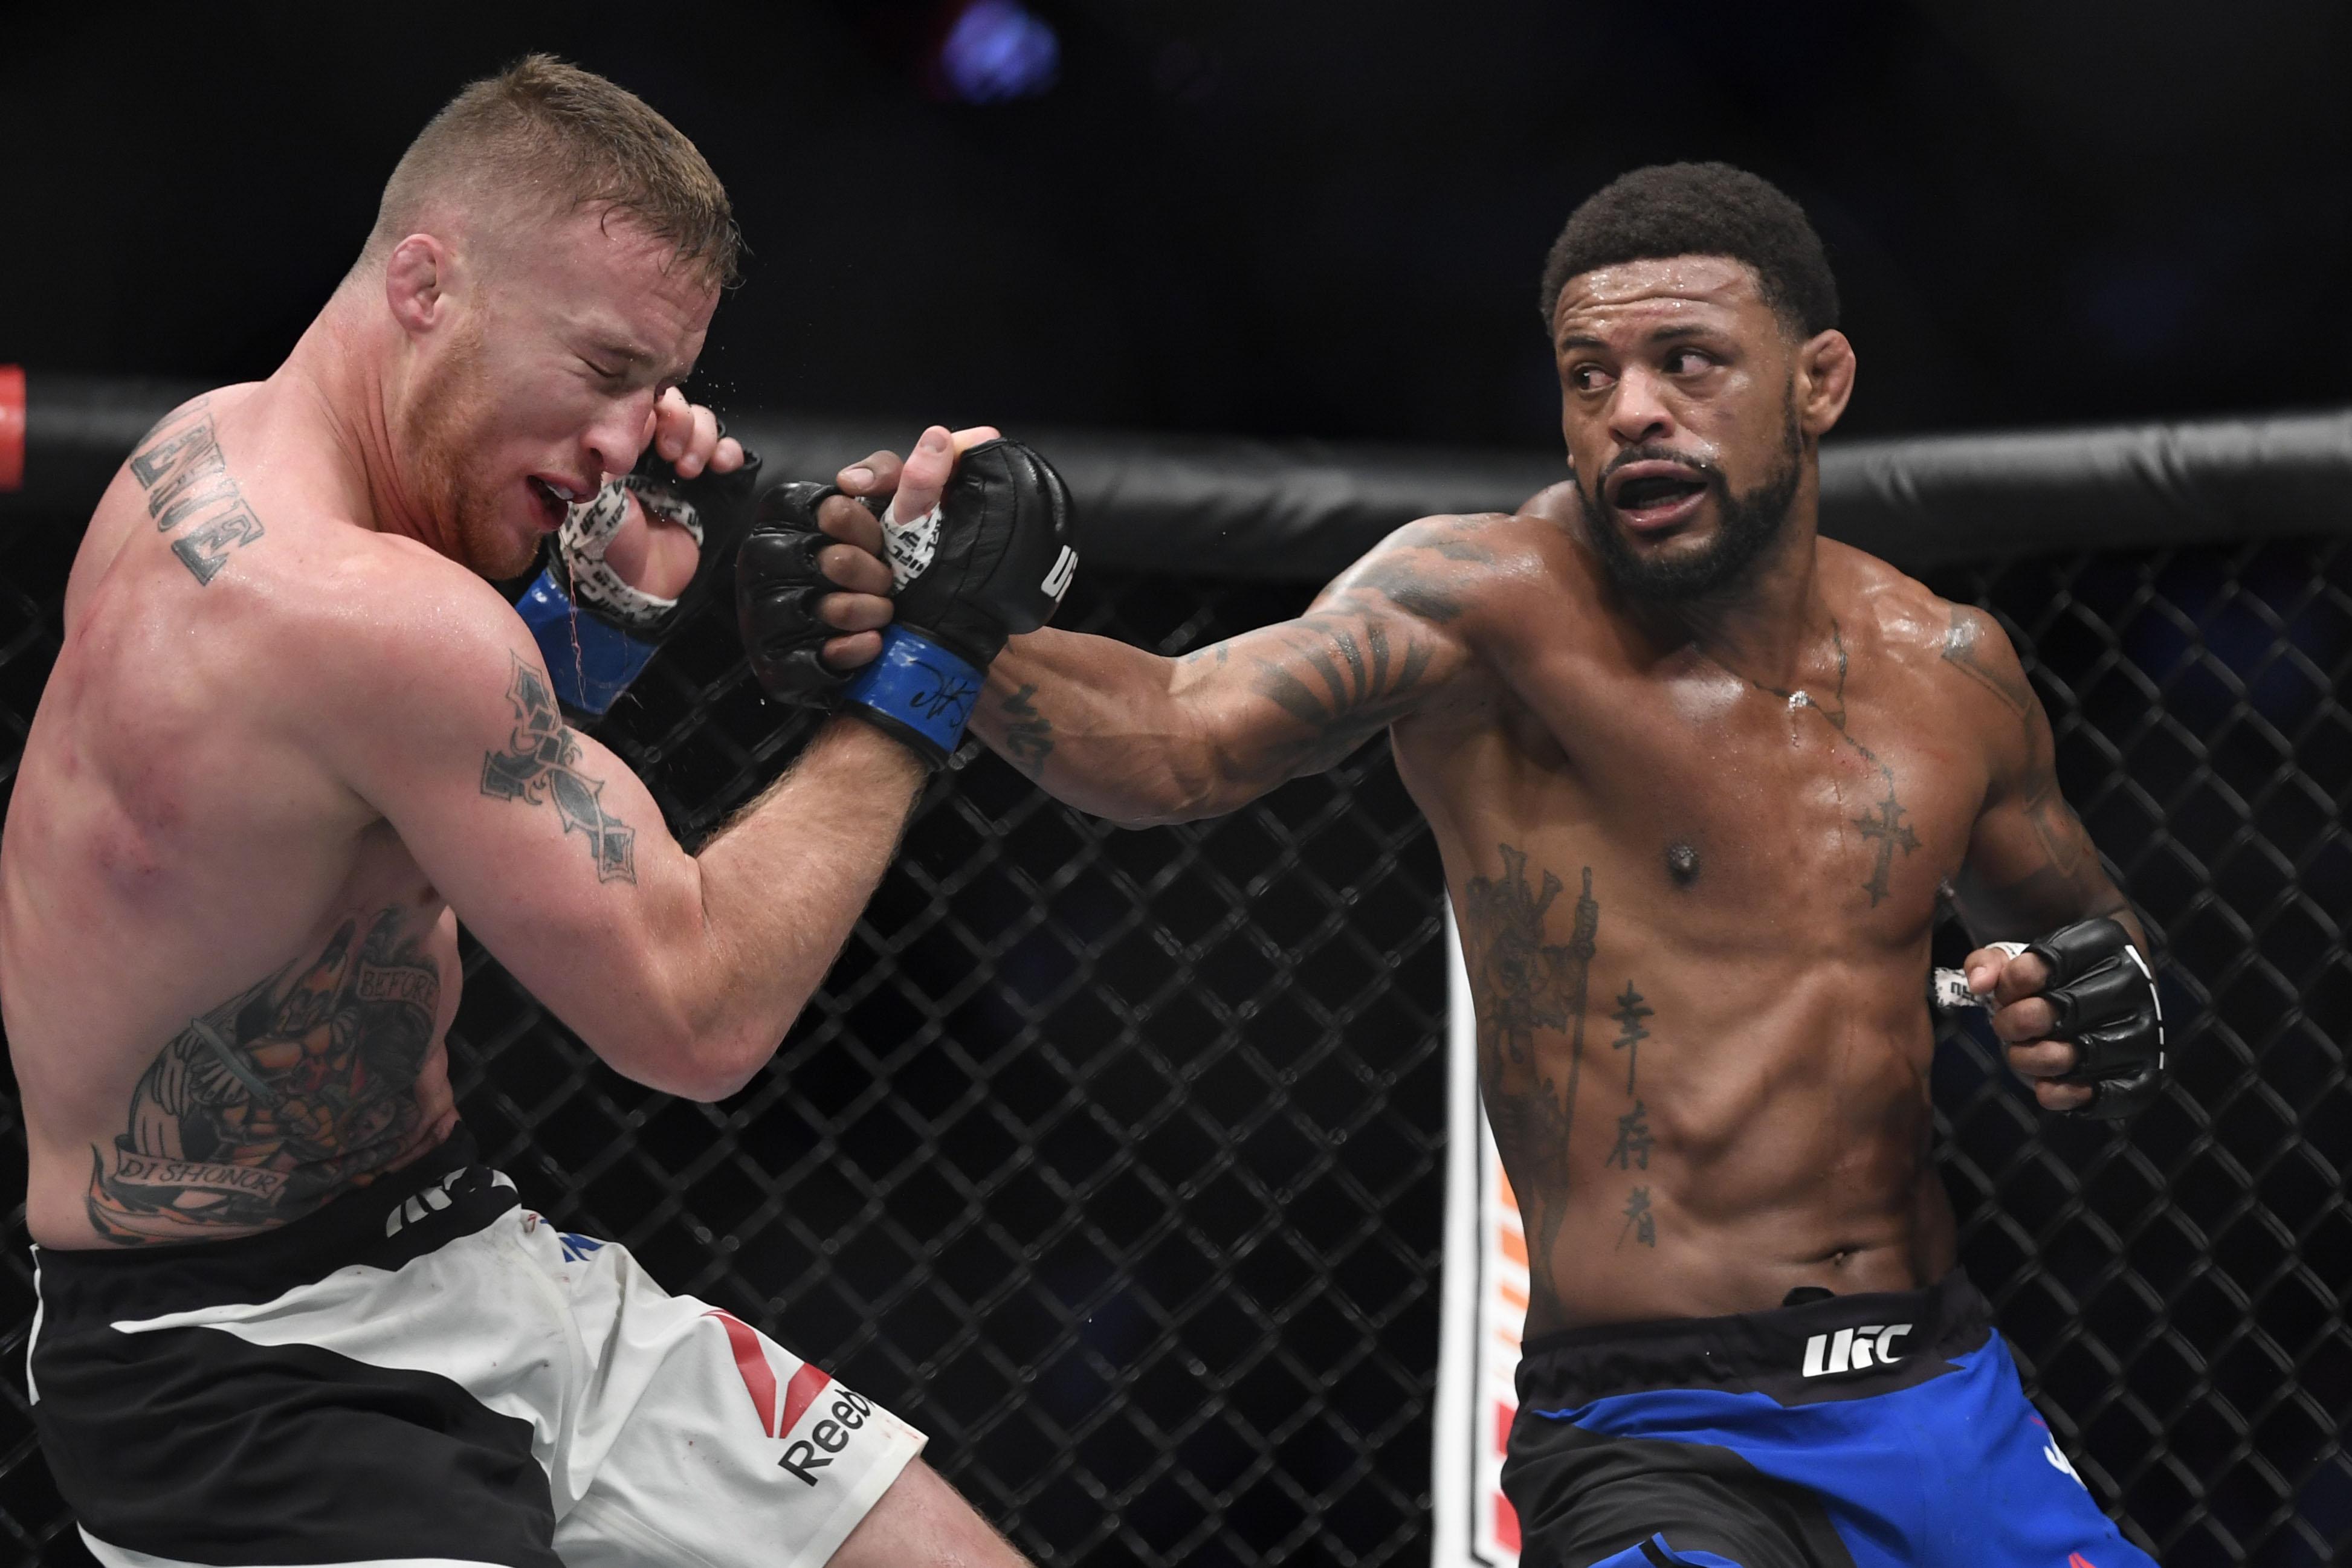 MMA: The Ultimate Fighter-Johnson vs Gaethje